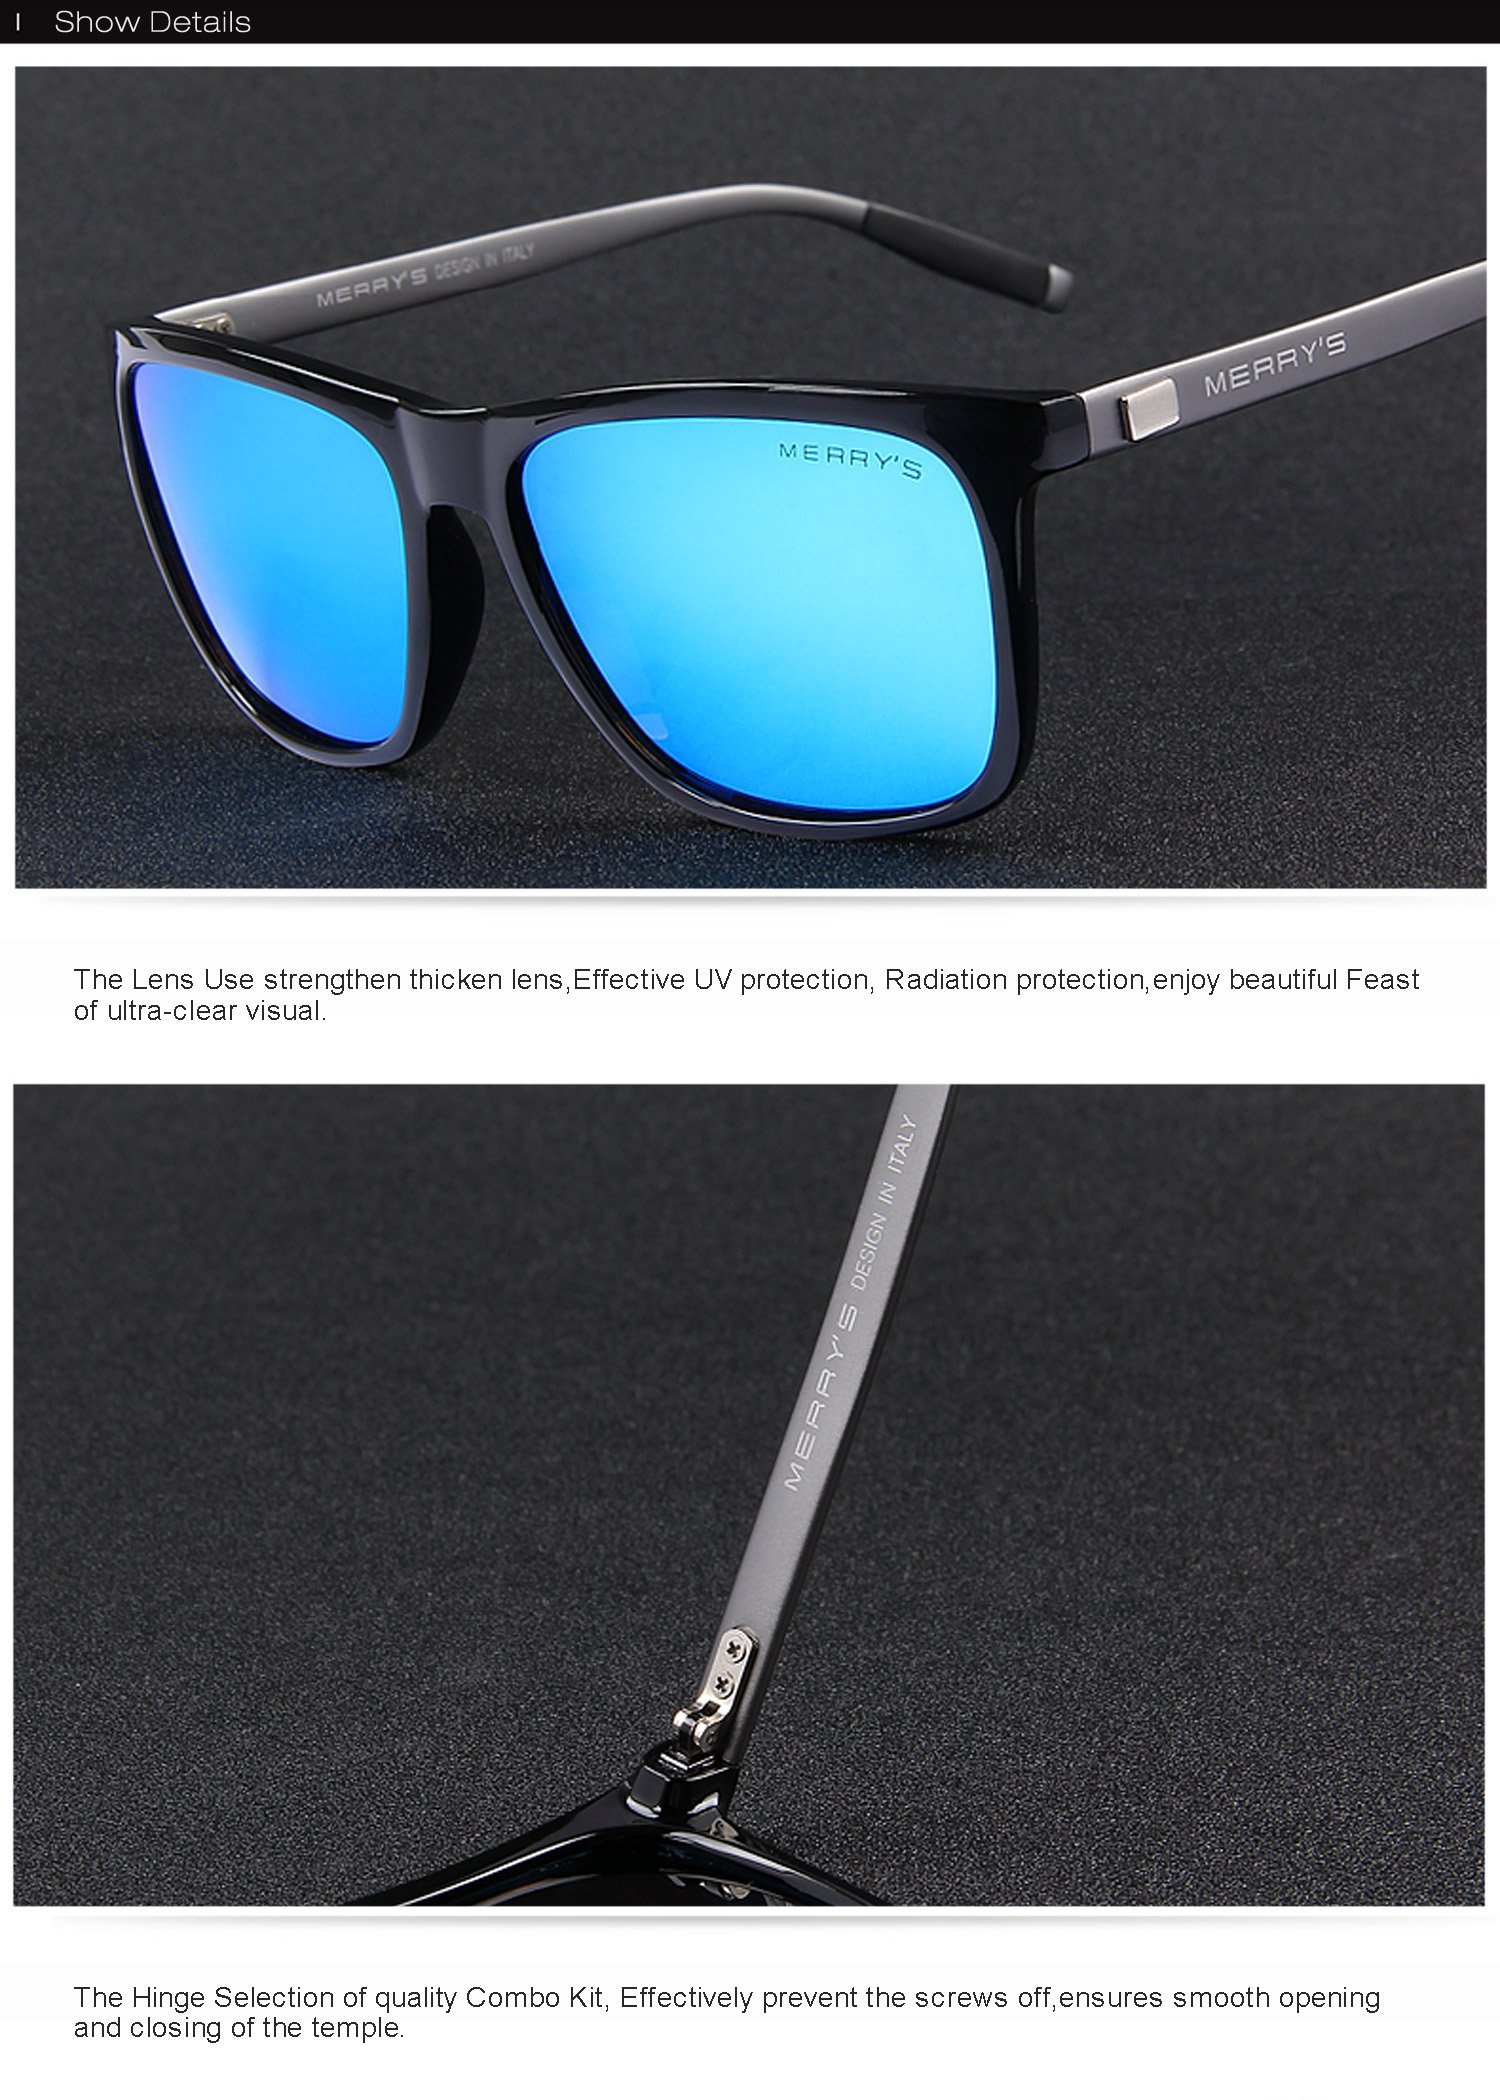 MERRY'S Unisex Polarized Aluminum Sunglasses Vintage Sun Glasses For Men/Women S8286 (Blue, 56) by MERRY'S (Image #7)